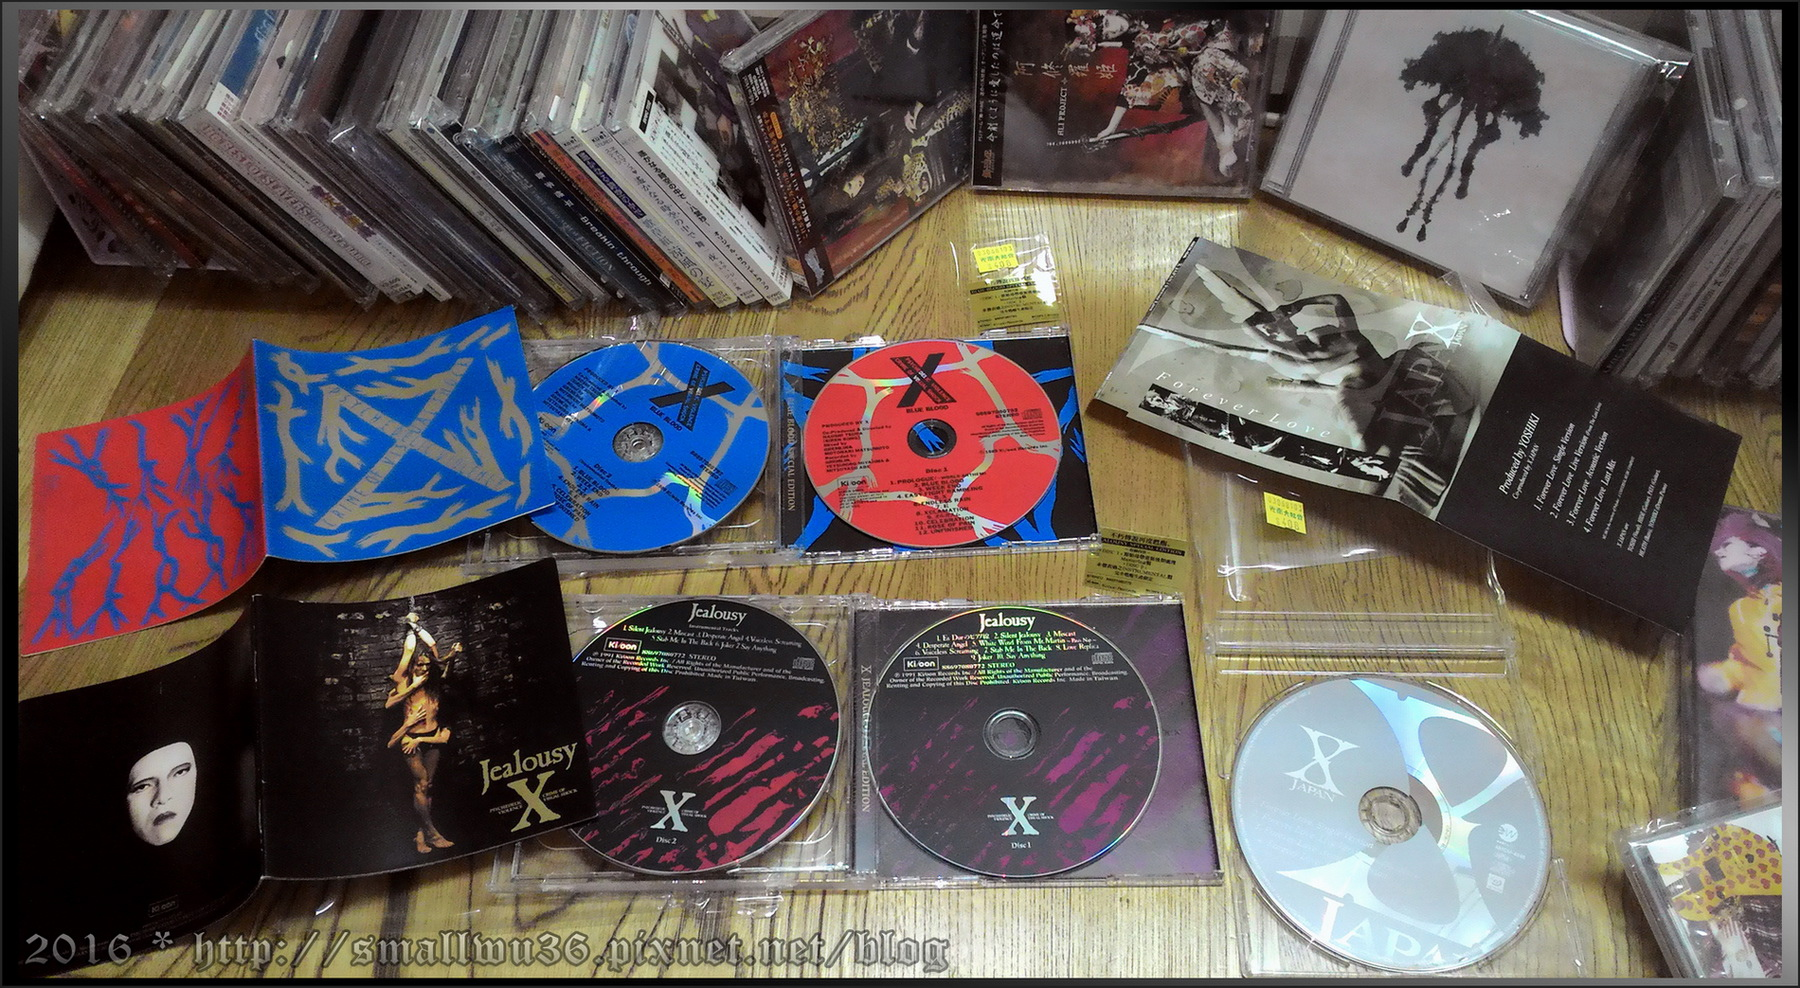 X JAPAN - 藍血 BLUE BLOOD (2CD)/Jealousy (2CD) SPECIAL EDITION